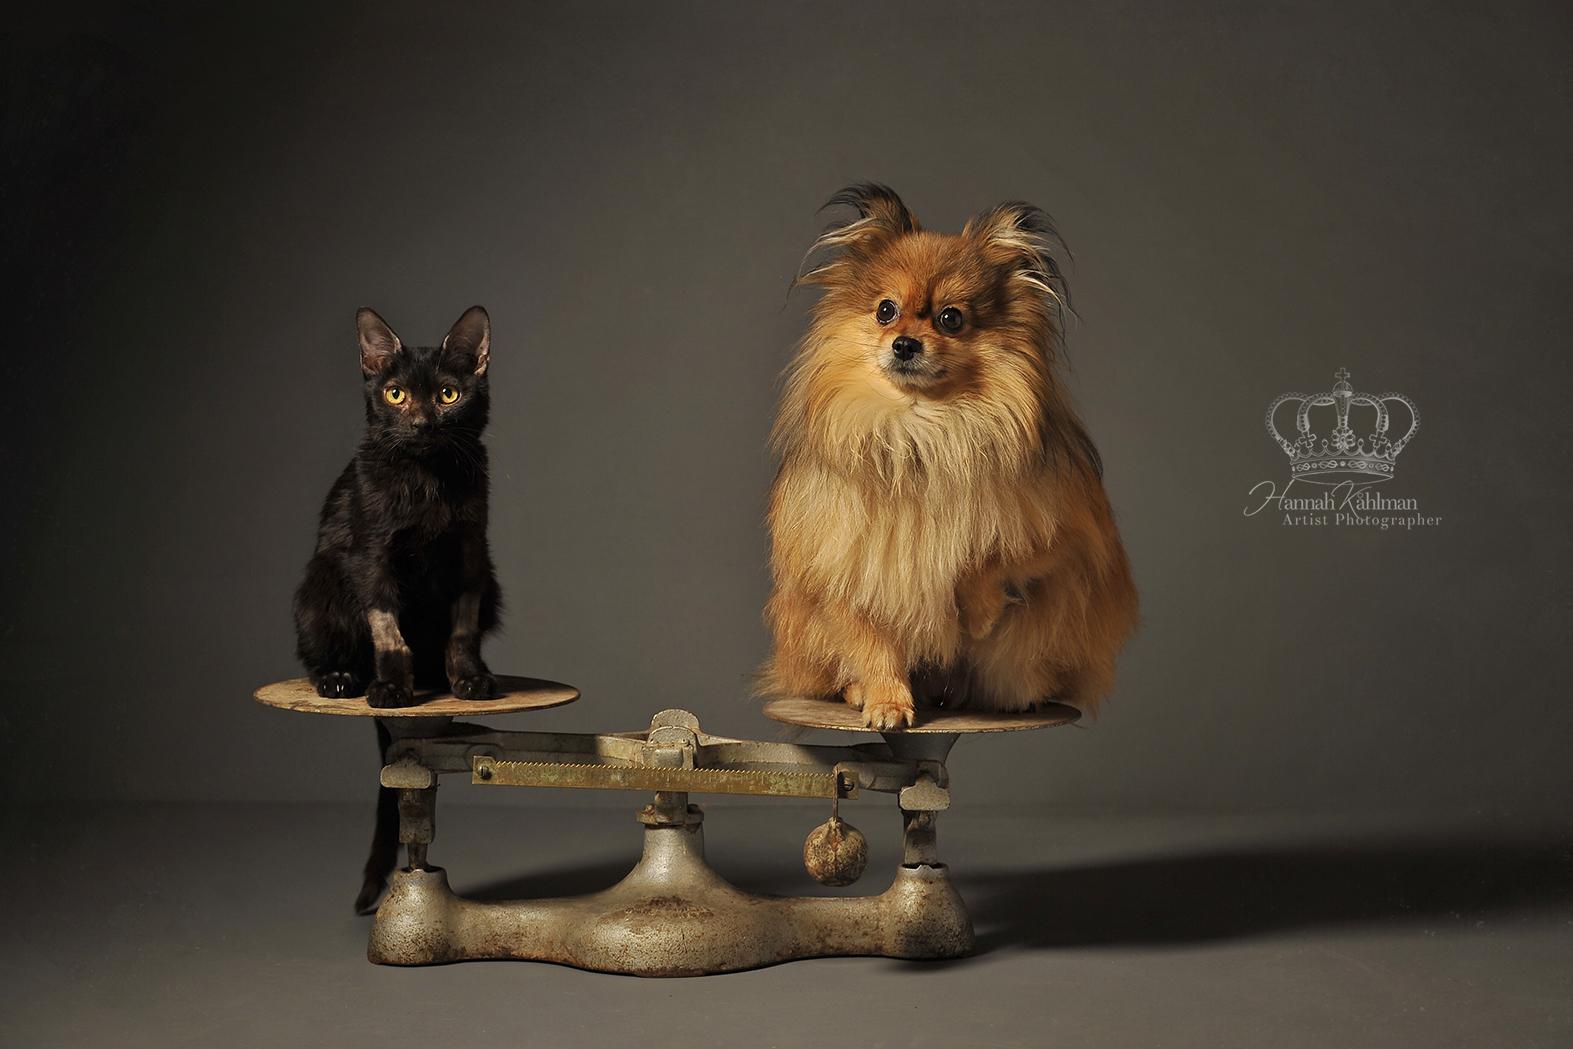 Black_kitten_and_dog_pomeranian_on_scale_portrait_Anchorage_Alaska_pet_photographer_Hannah_Kåhlman_A